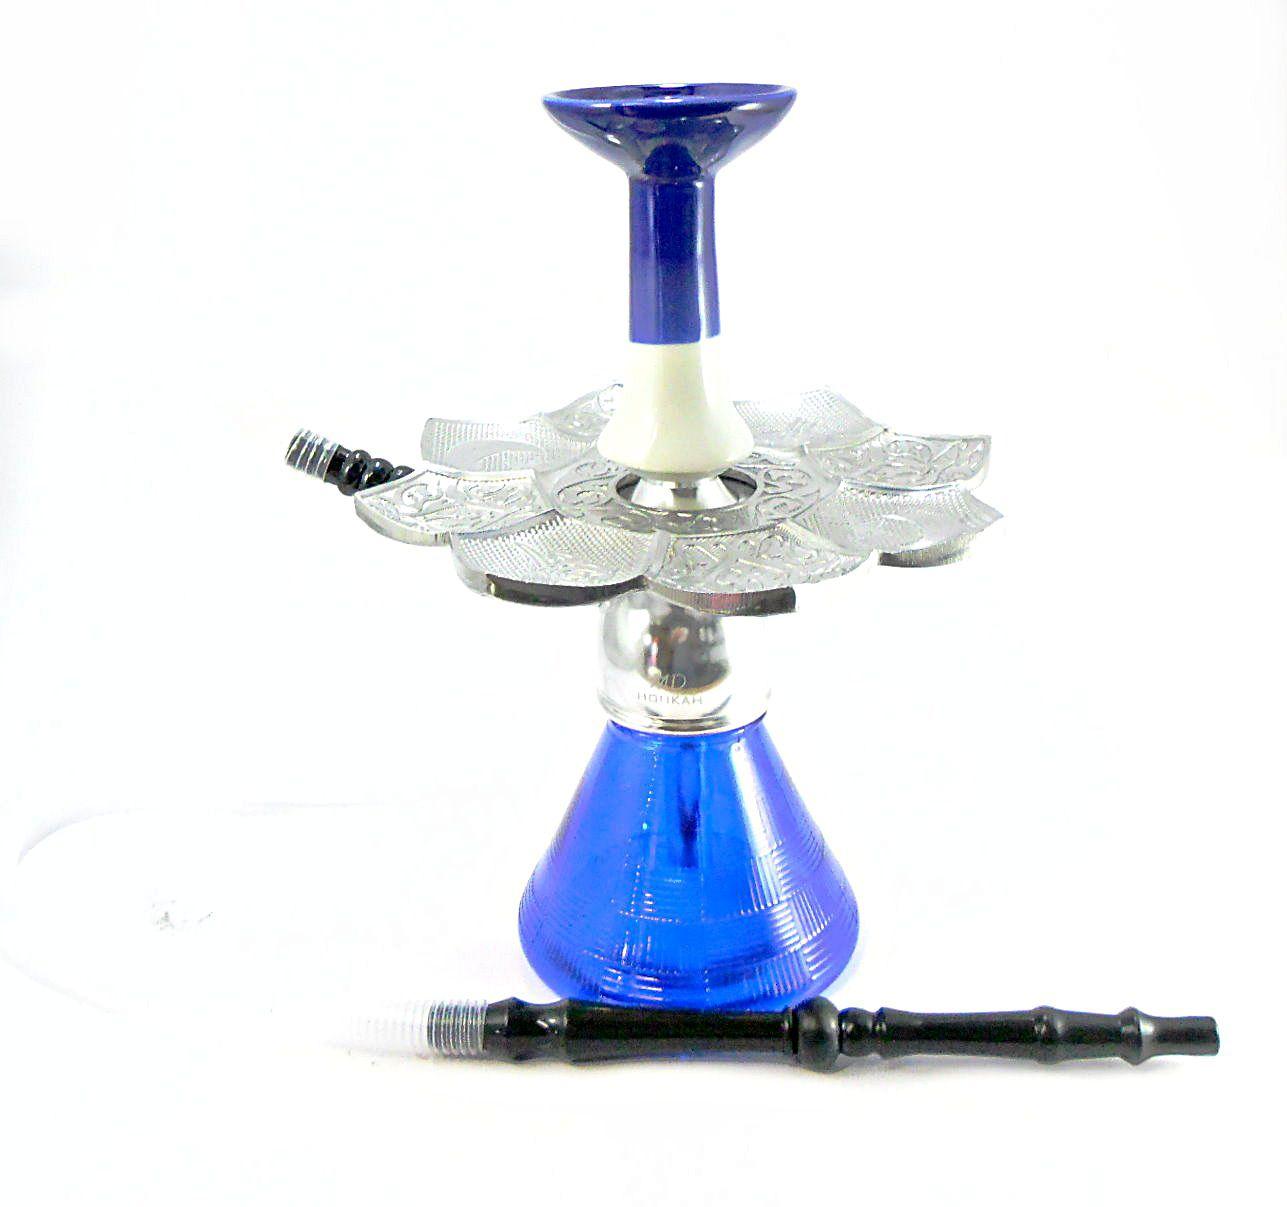 Narguile Completo:Stem MD alumínio, vaso AZUL, mangueira lavável, rosh funil e prato El Nefes Crom.